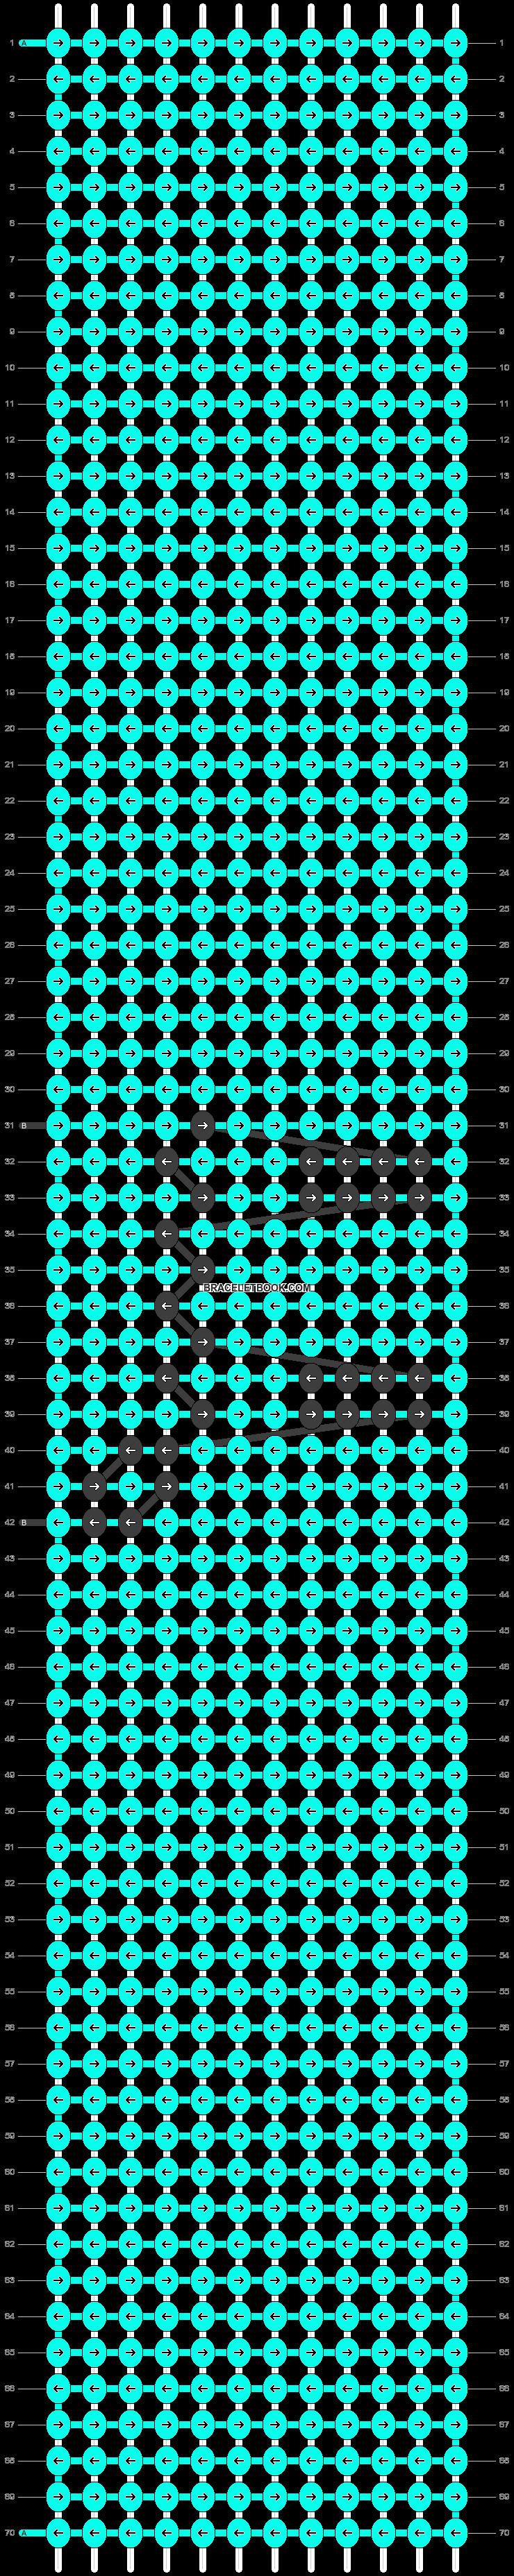 Alpha pattern #94028 pattern